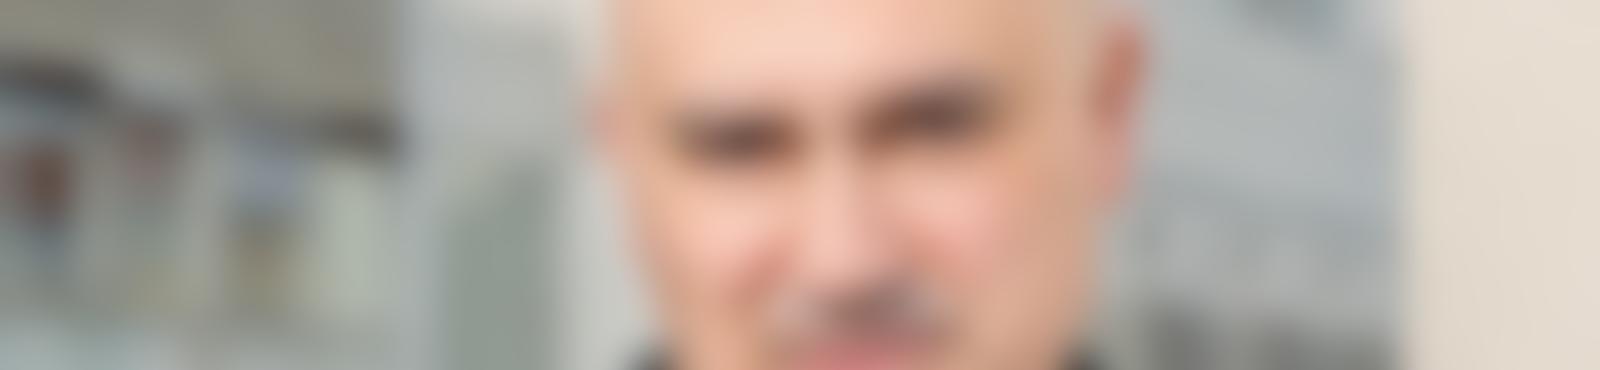 Blurred a38685a8 5c62 41fd 990c 7eaa67ba17e7